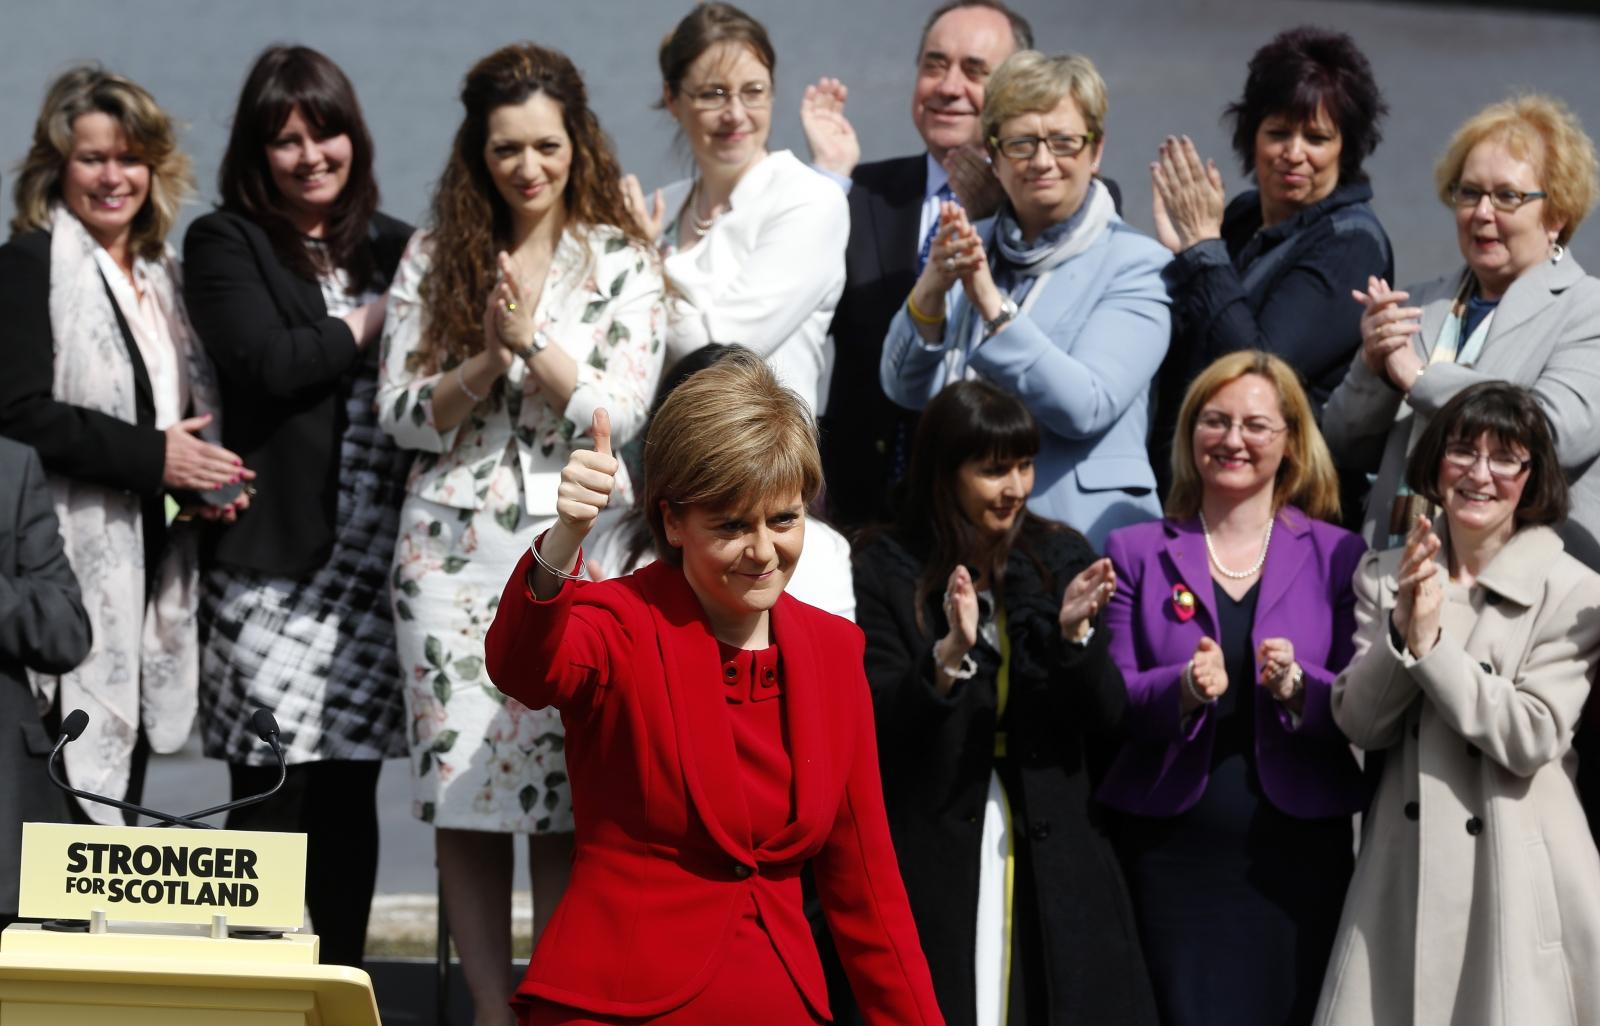 Nicola Sturgeon unveils 56 MPs